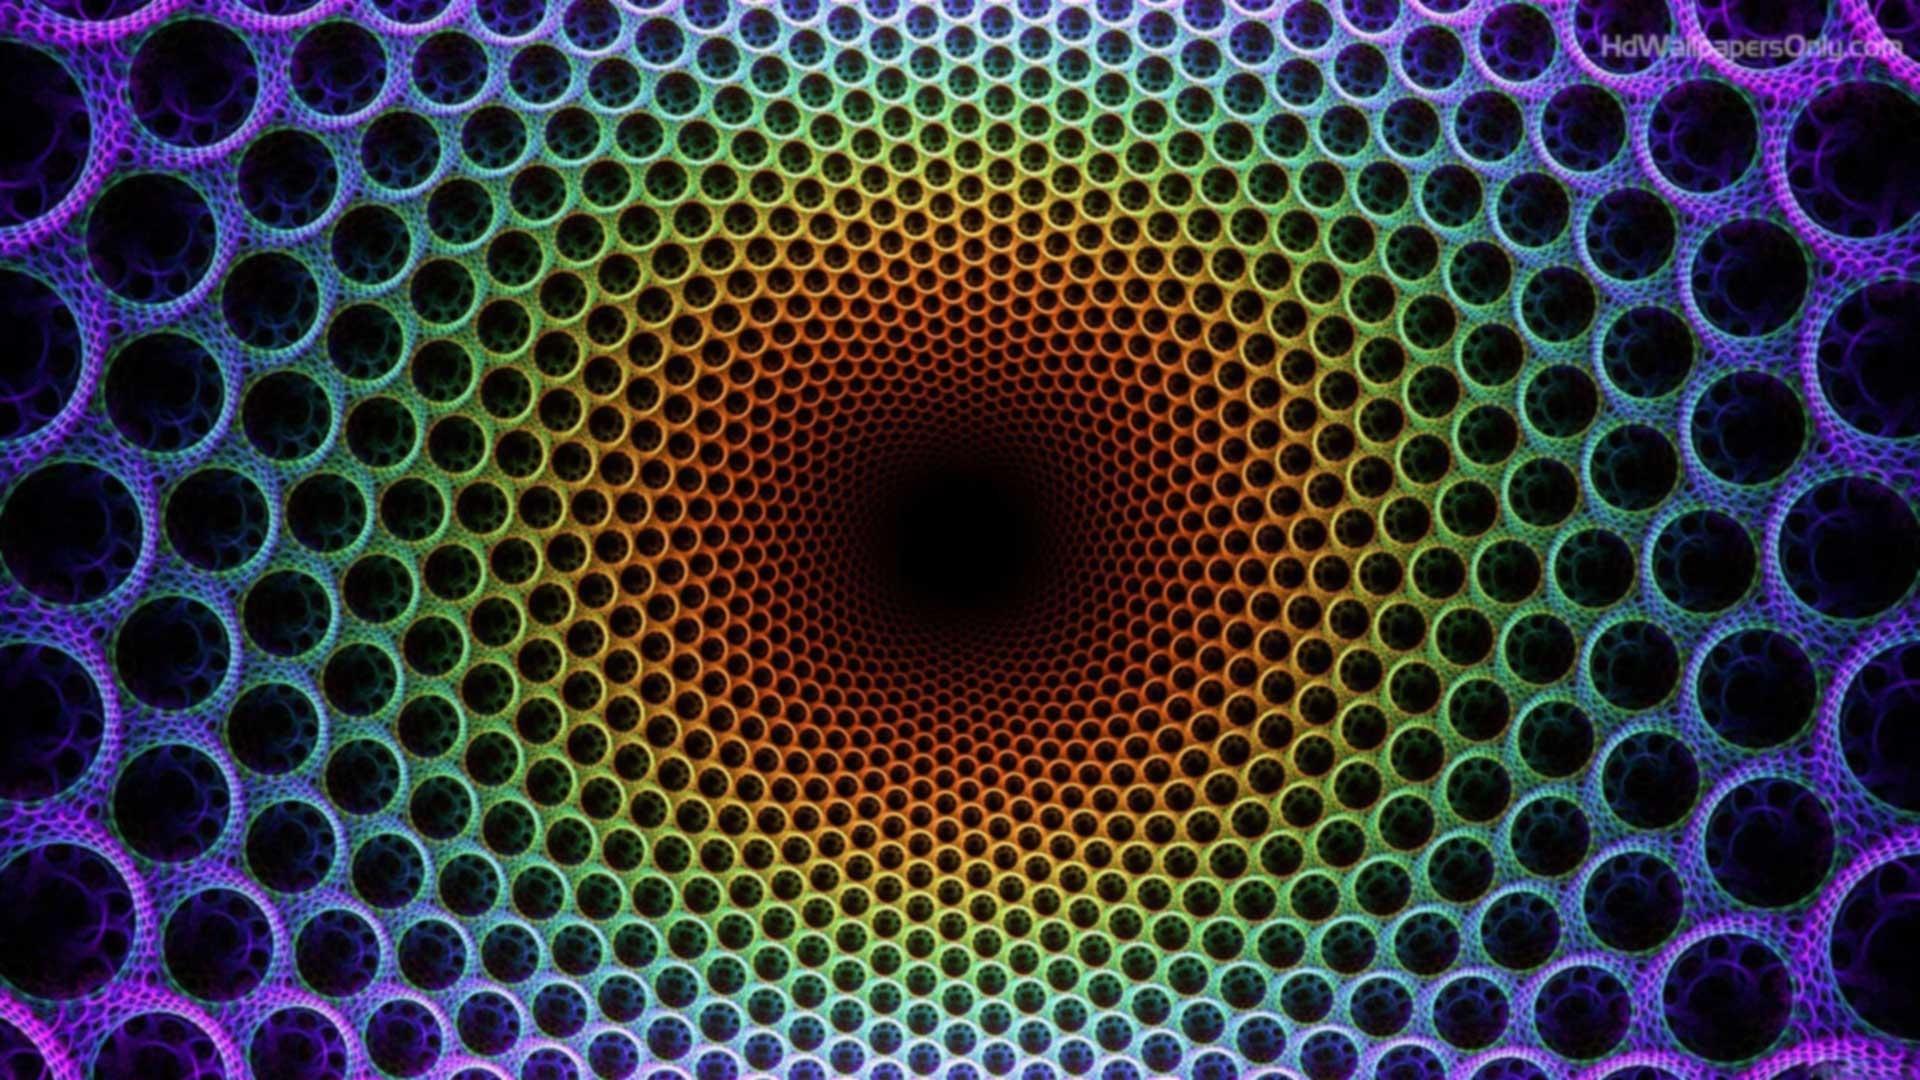 3d moving illusion best wallpaper 22752 - baltana